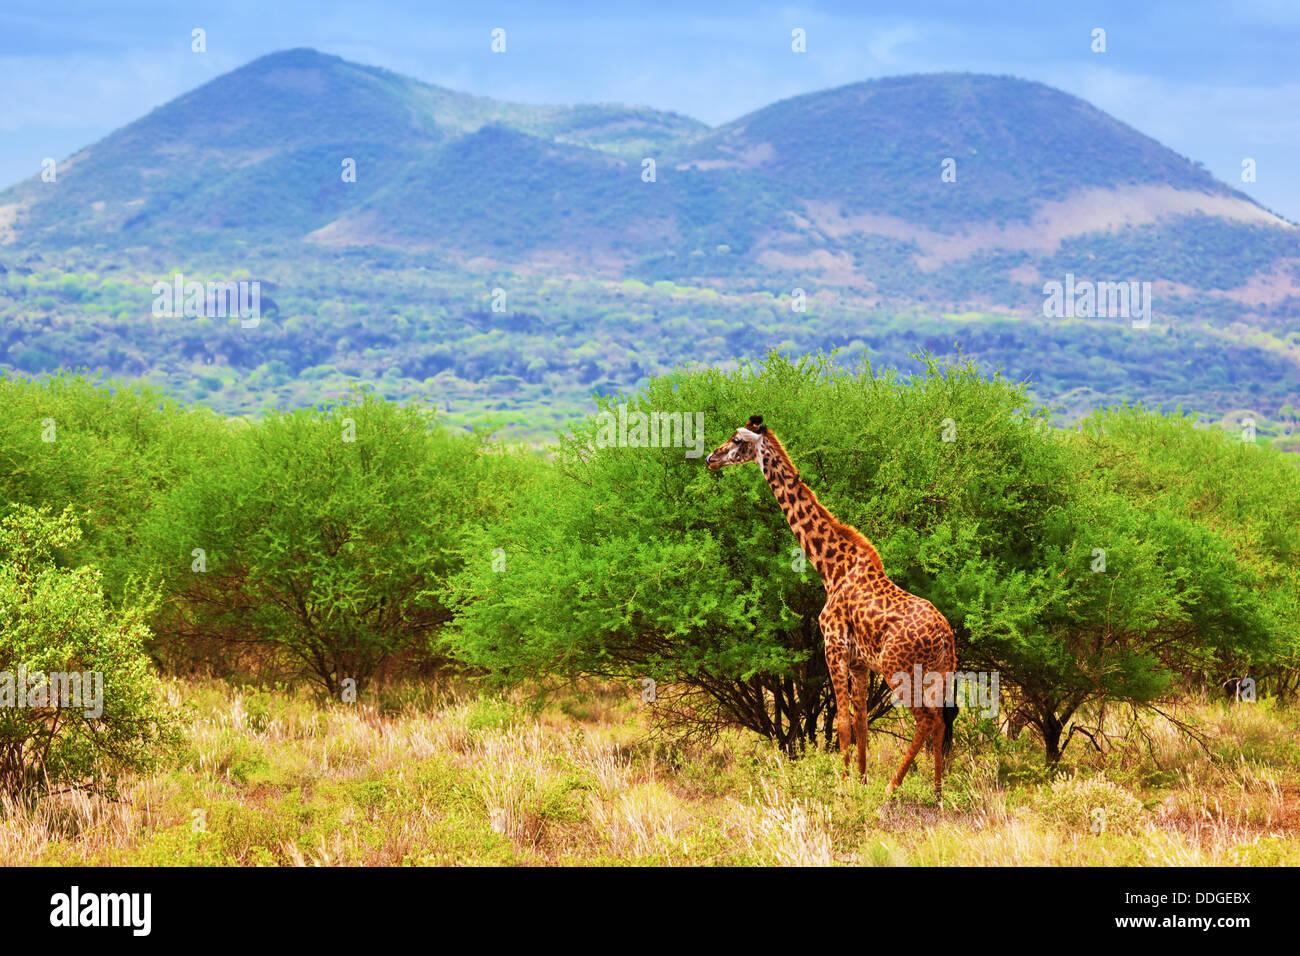 Giraffe a Tsavo West National Park, Kenya, Africa - fauna africana Immagini Stock